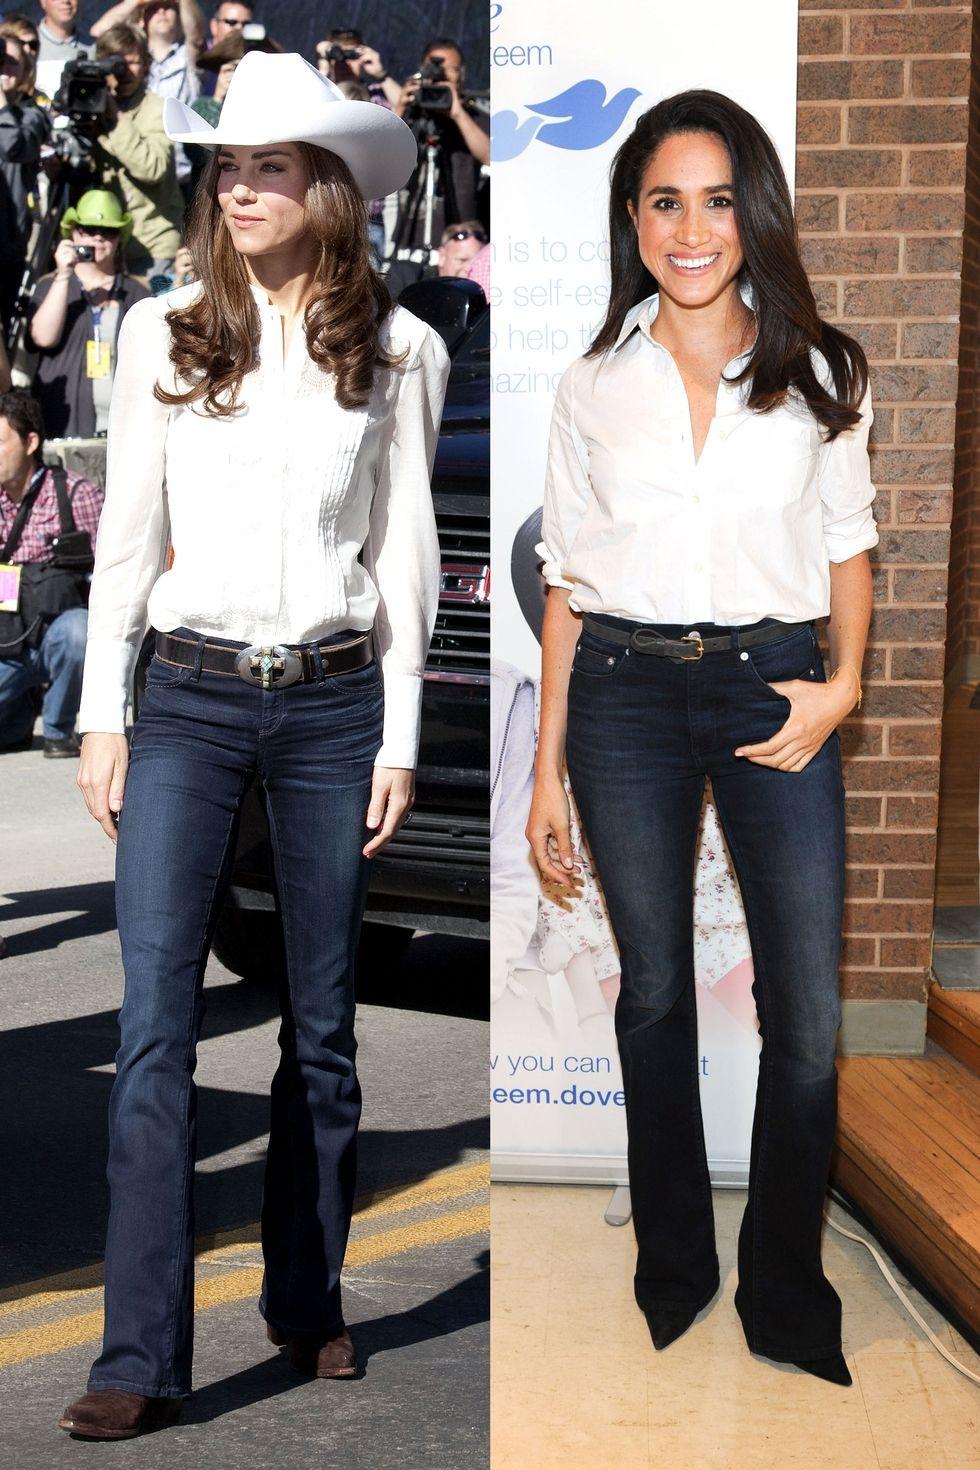 kate-meghan-white-button-down-blue-jeans-1512162286